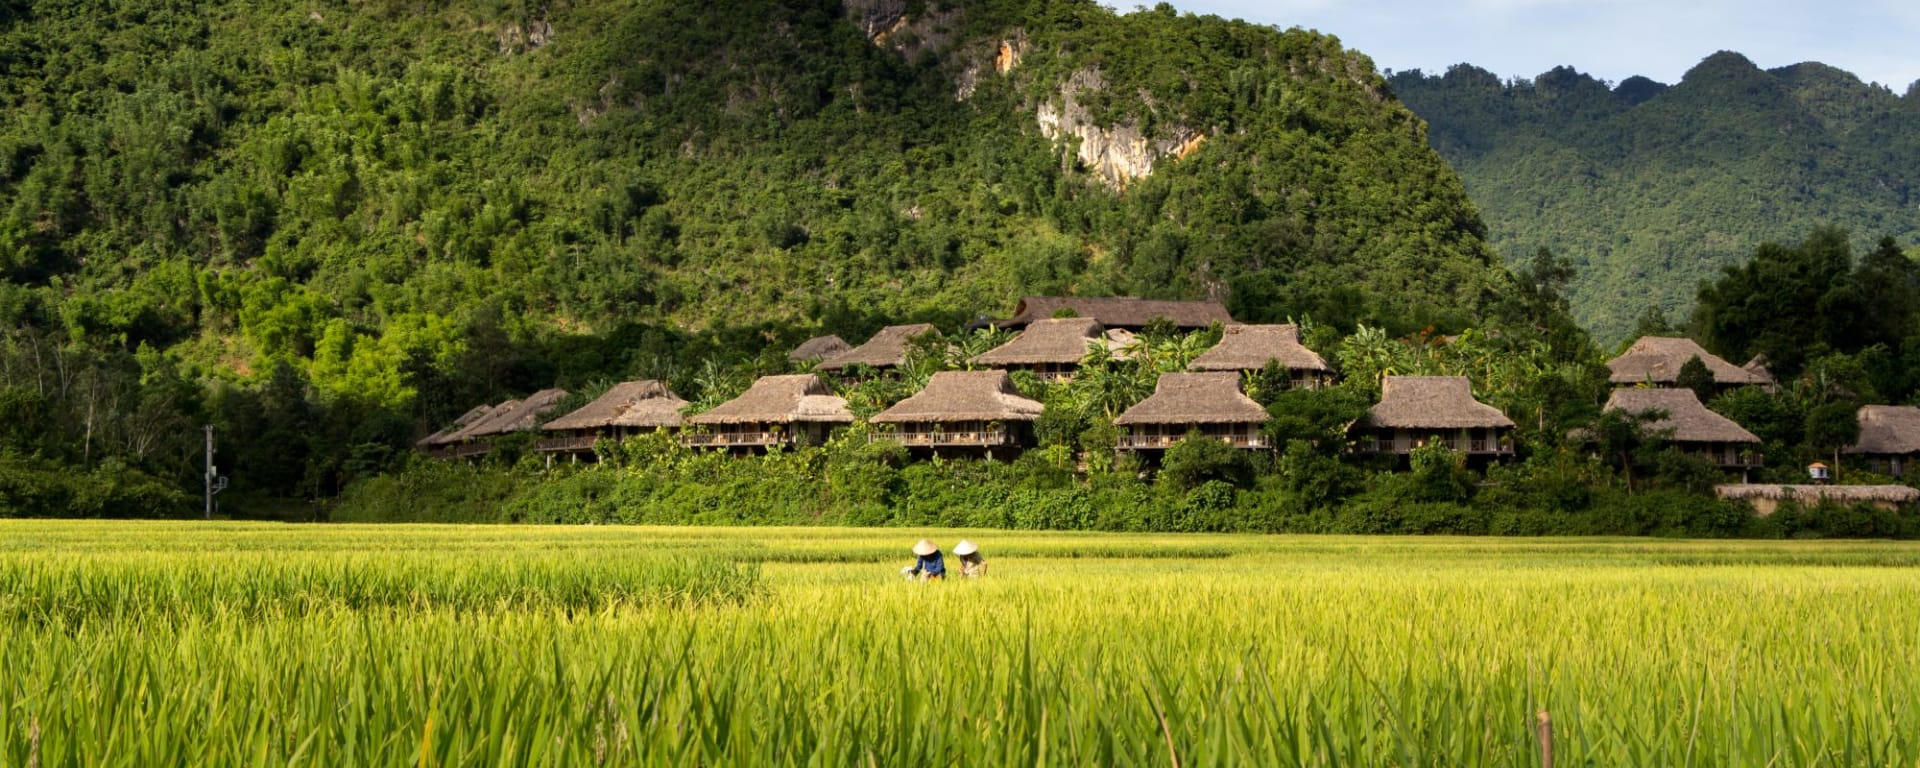 Impressionen Nordvietnams ab Hanoi: Mai Chau